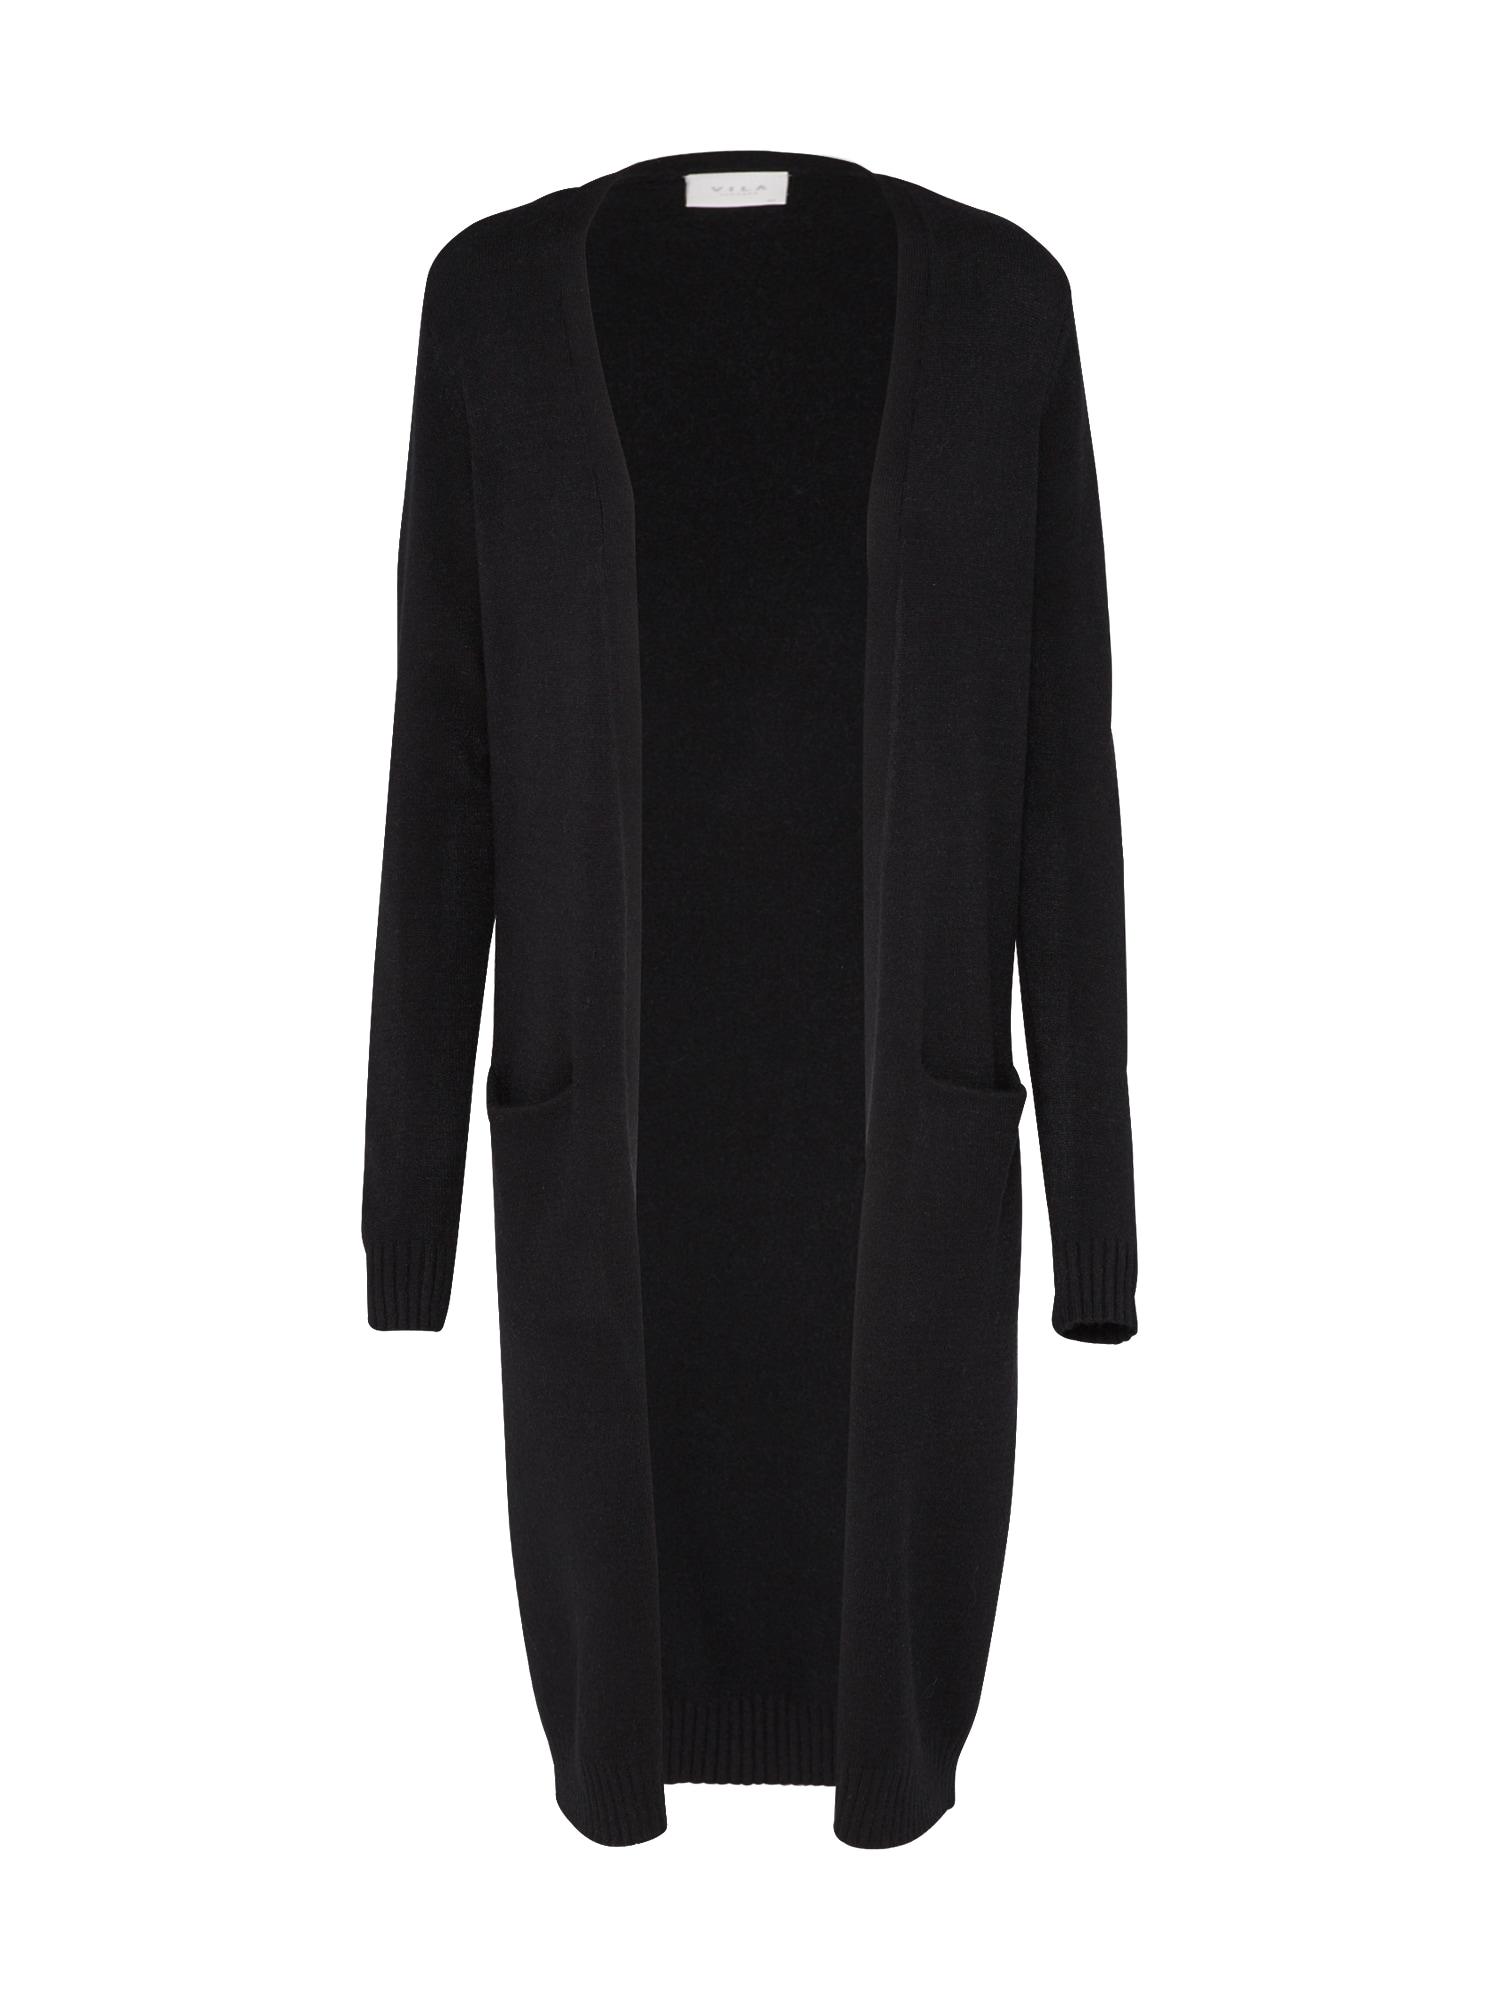 Pletený kabátek Ril černá VILA